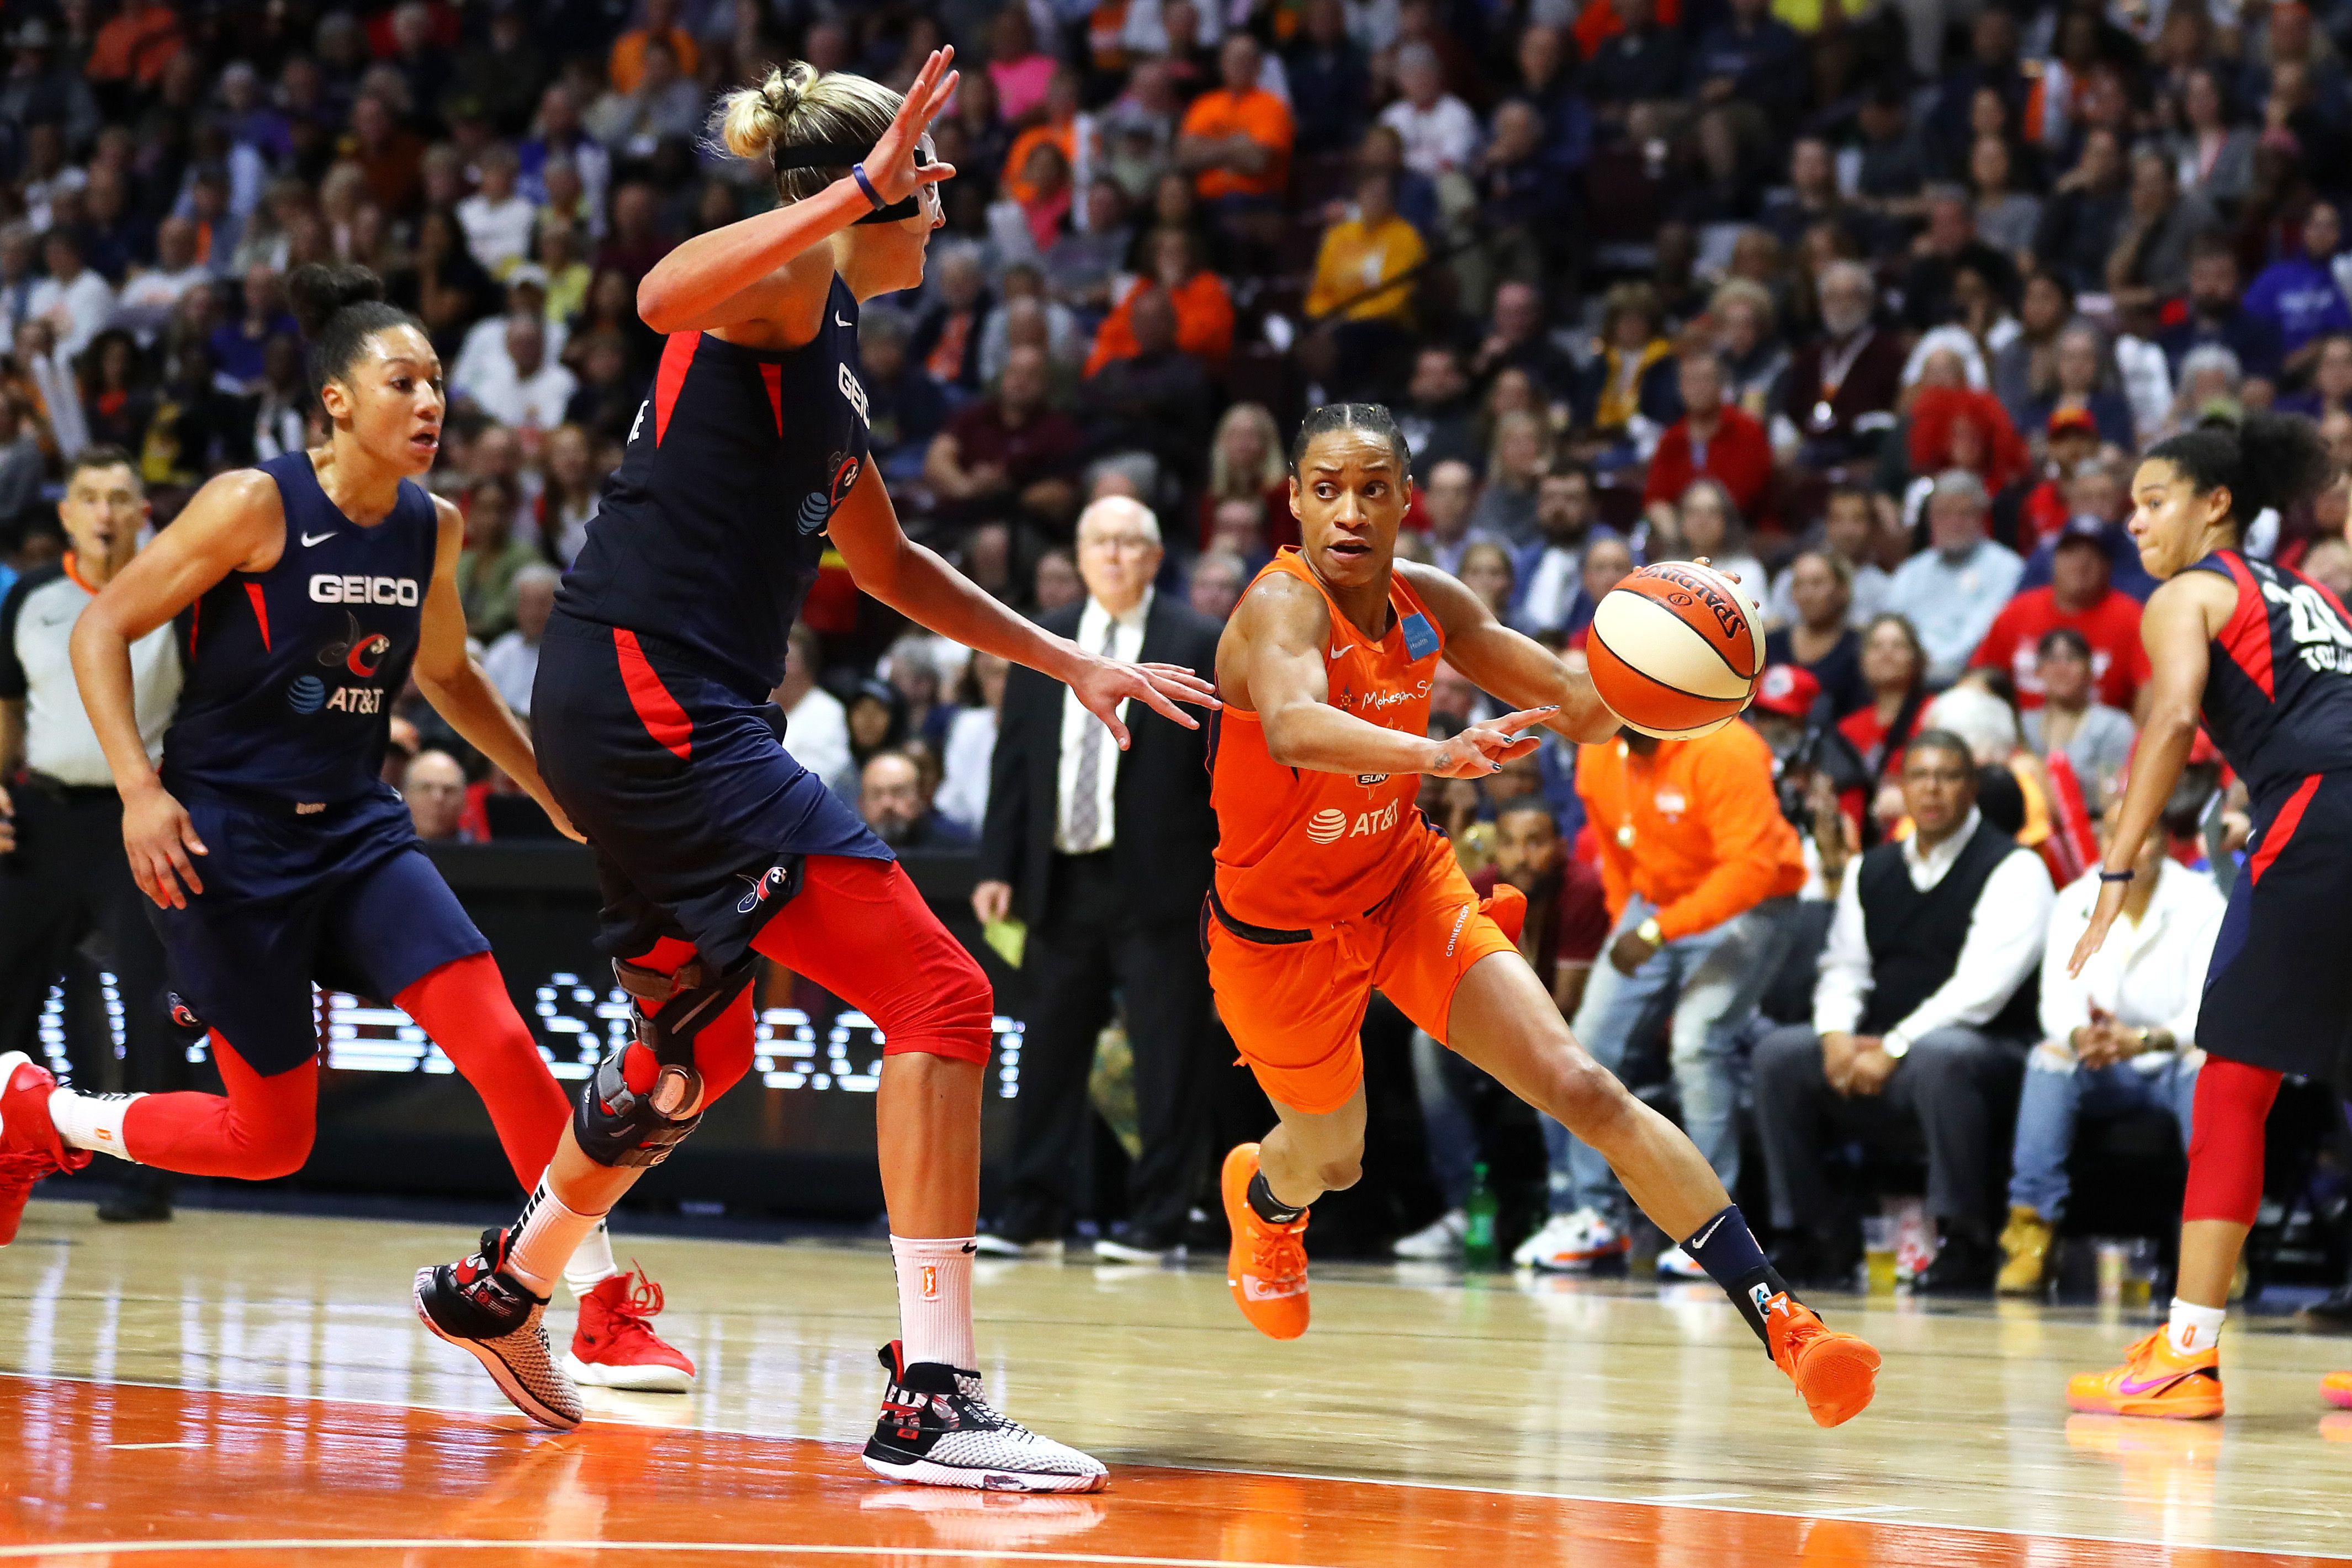 Coronavirus causes delay in WNBA season and training camps